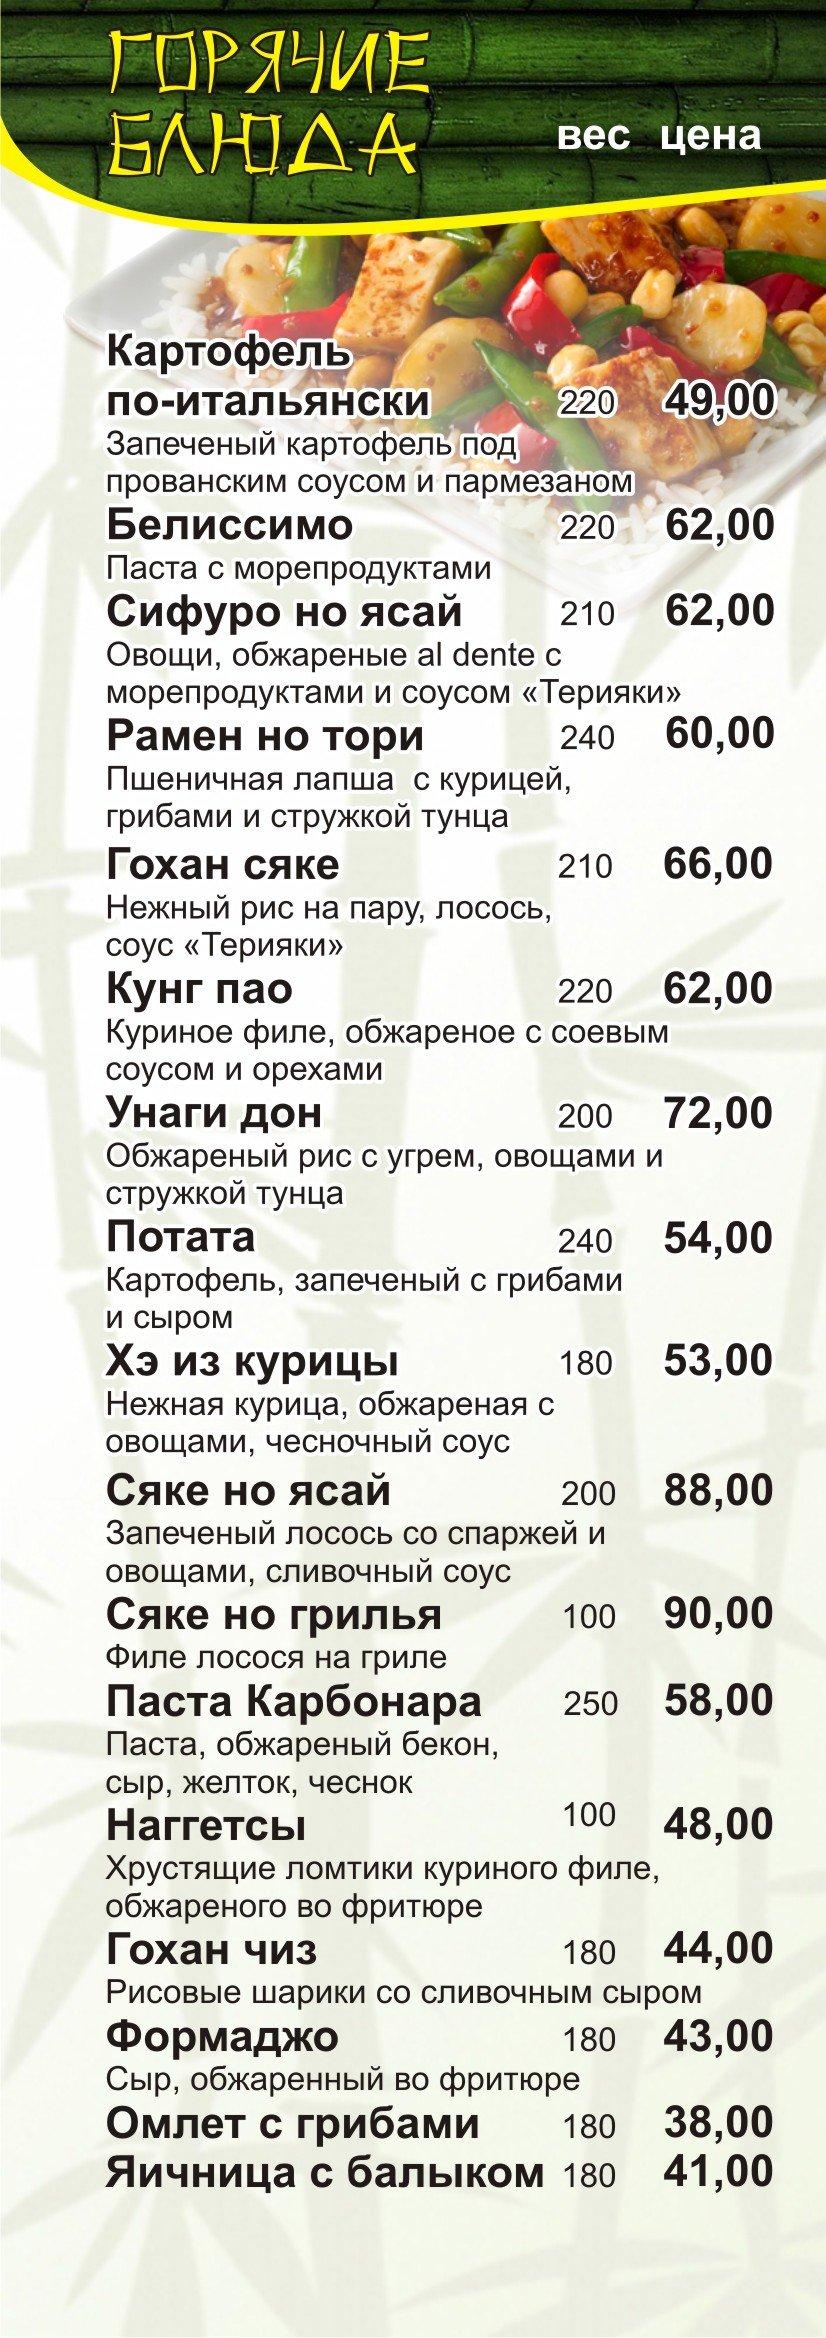 "Суши бесплатно! Праздничное предложение от кафе ""Панда - пицца, роллы"", фото-5"